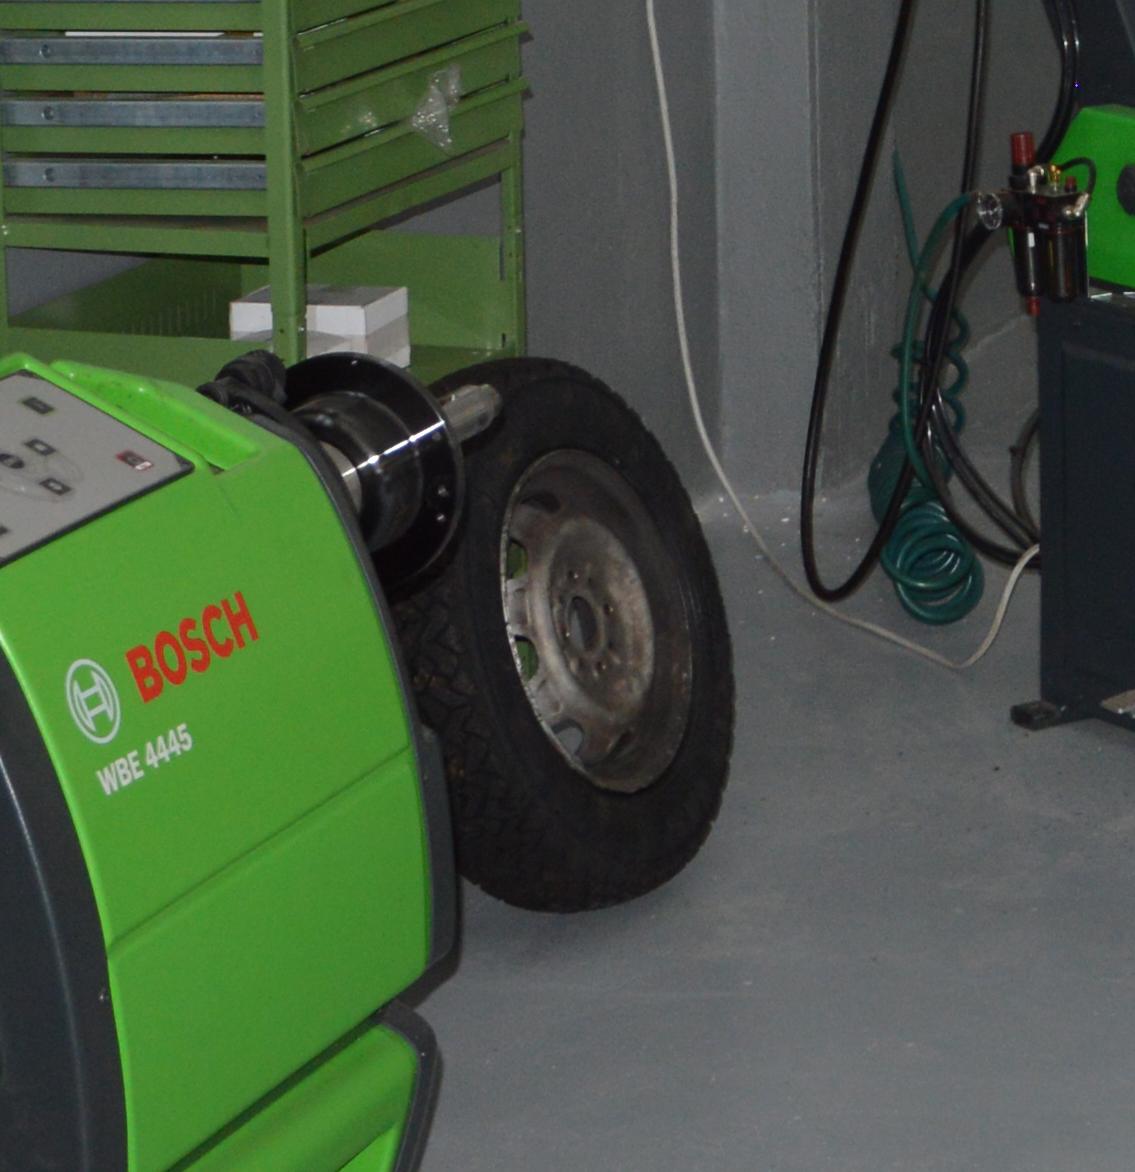 Centro Pneumatici Autofficina RB2 a Poggibonsi Siena